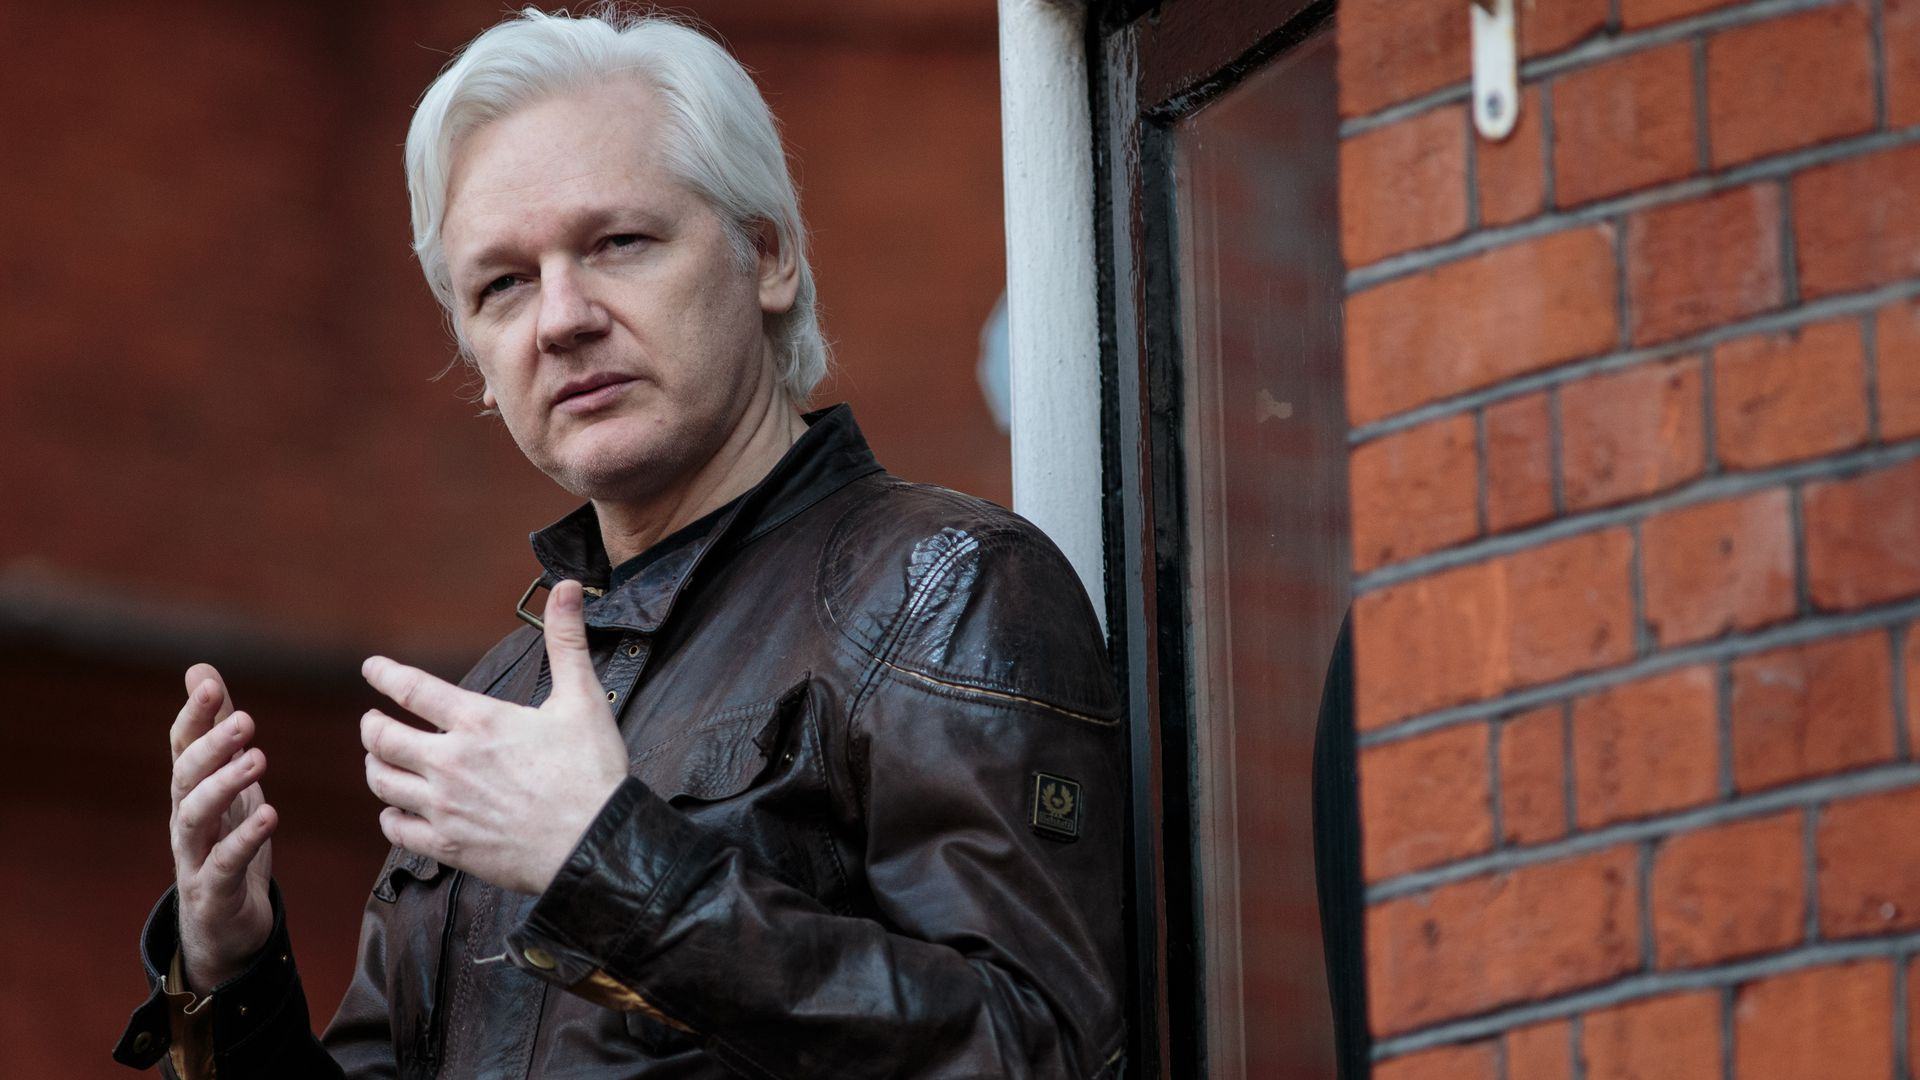 Julian Assange speaking to the media